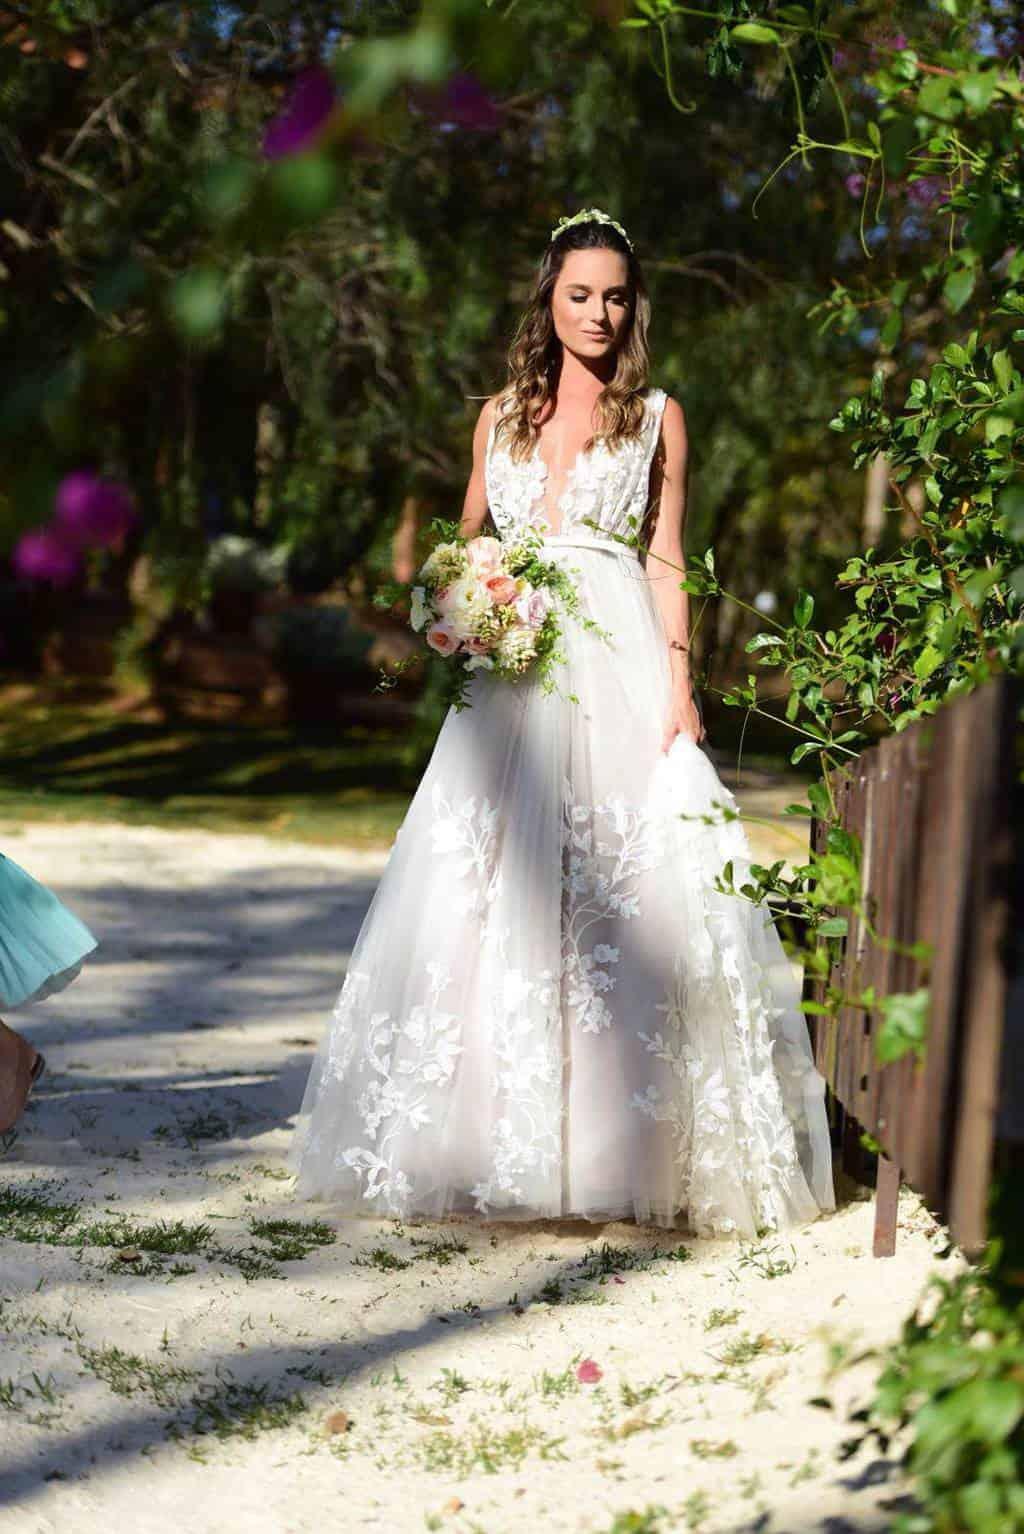 beleza-da-noiva-casamento-boho-Casamento-Nicolle-e-Pedro-casamento-rosa-Estalagem-Alter-Real-Fotografia-Estudio-Maria-Celia-Siqueira-Fotografia-Rosana-Sales-Goiania-look-da-noiva-noiva-100